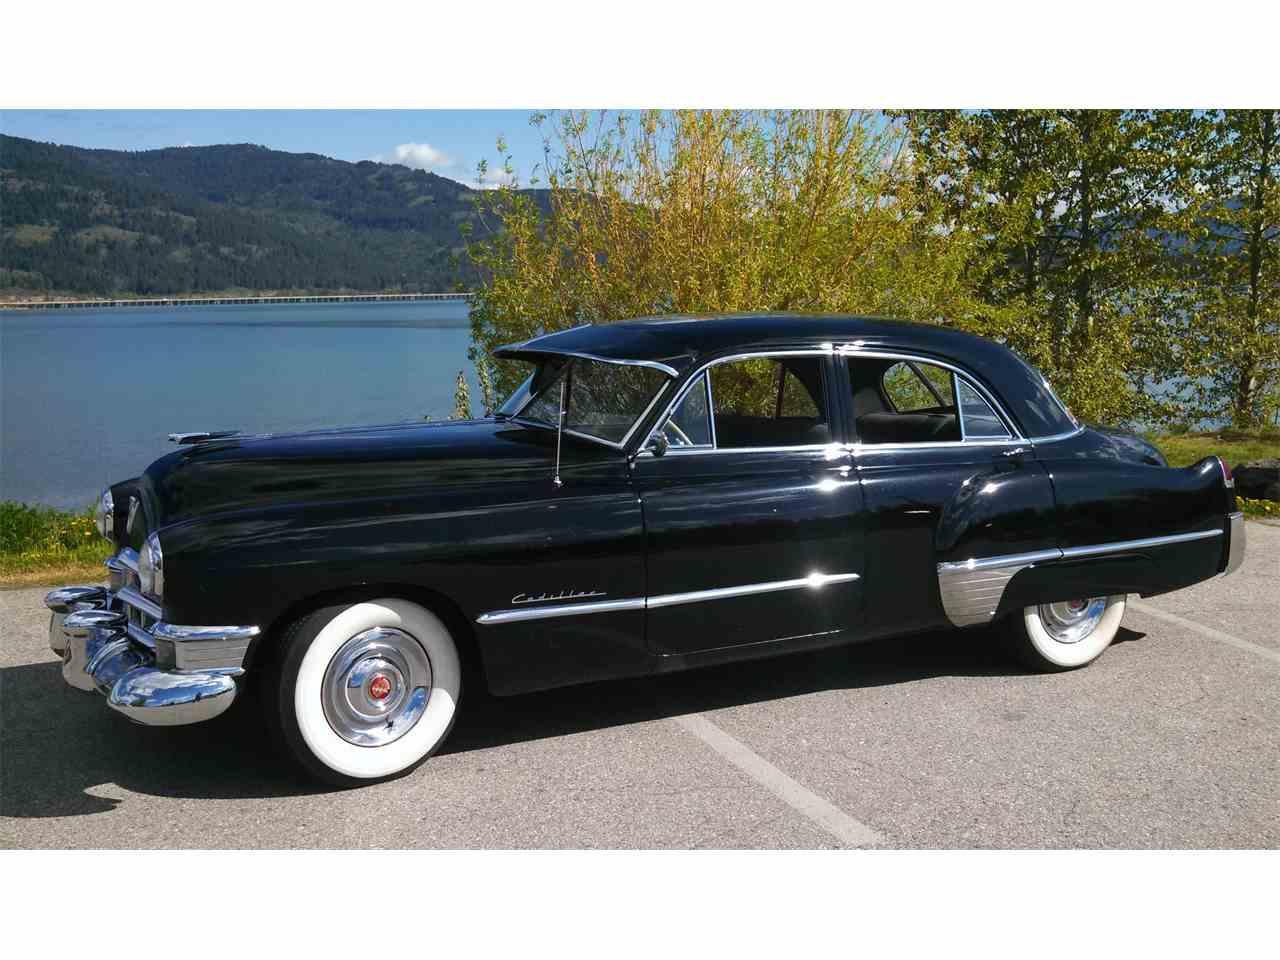 1949 Cadillac Series 62 For Sale Classiccars Com Cc 579513